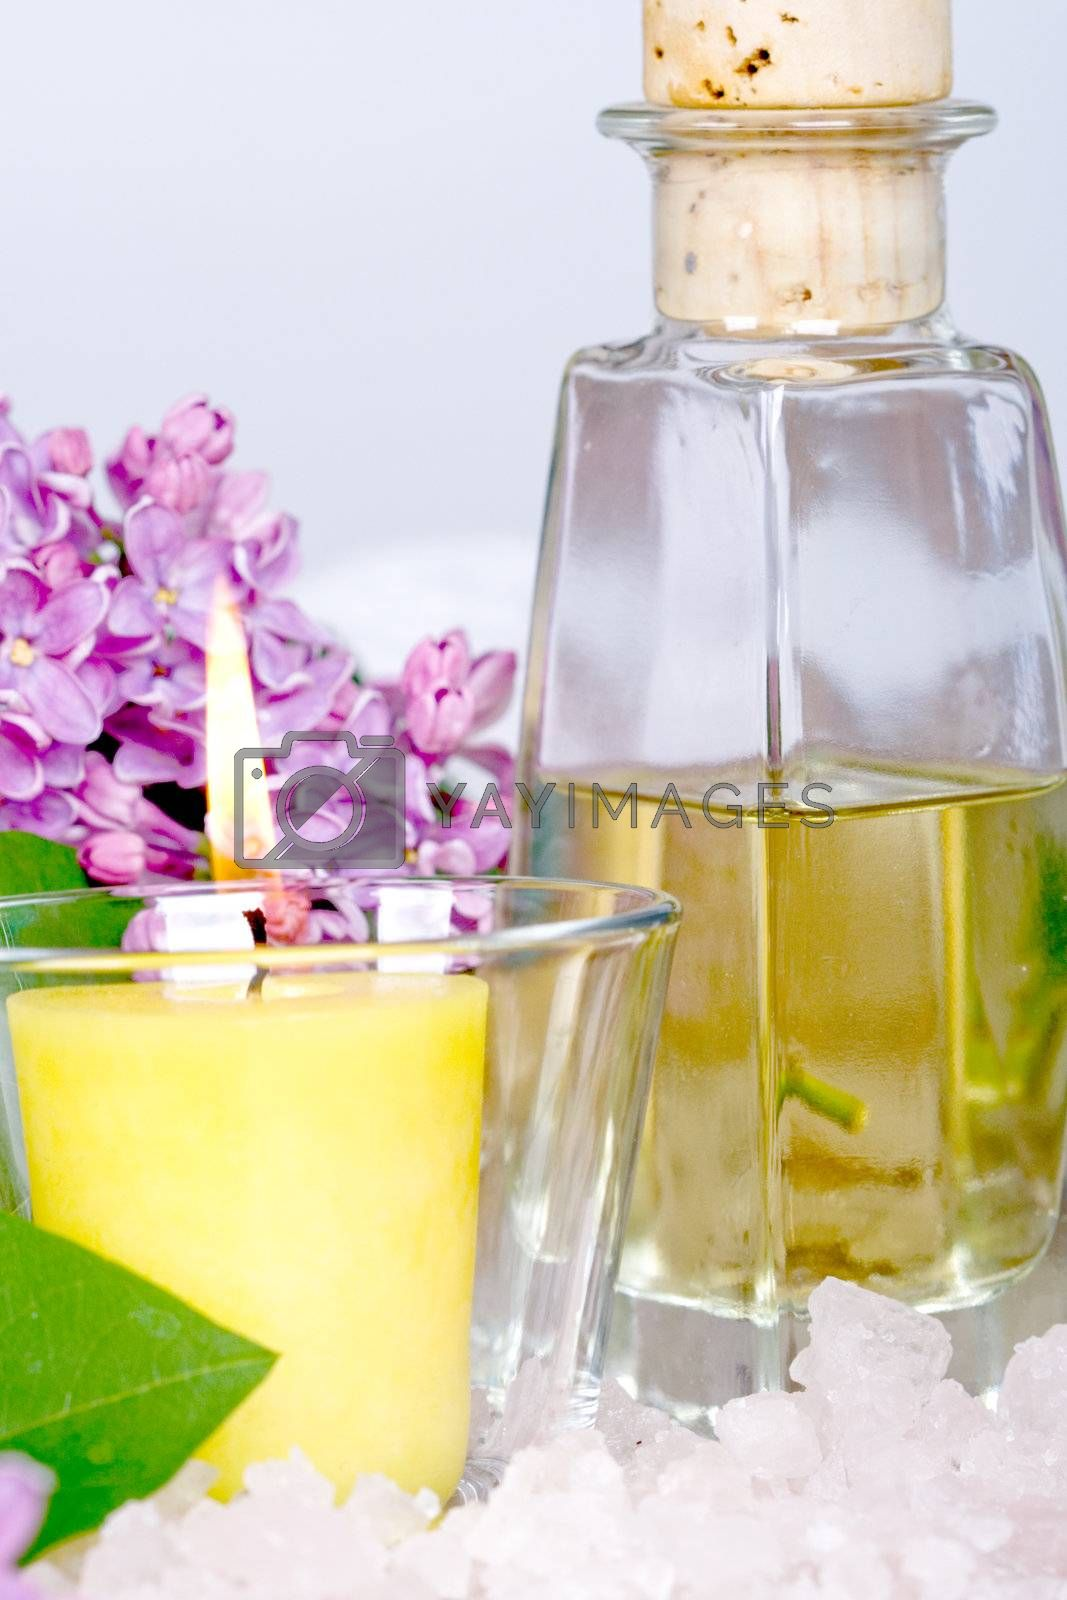 bath and spa items (oil, salt, lilac, candle)